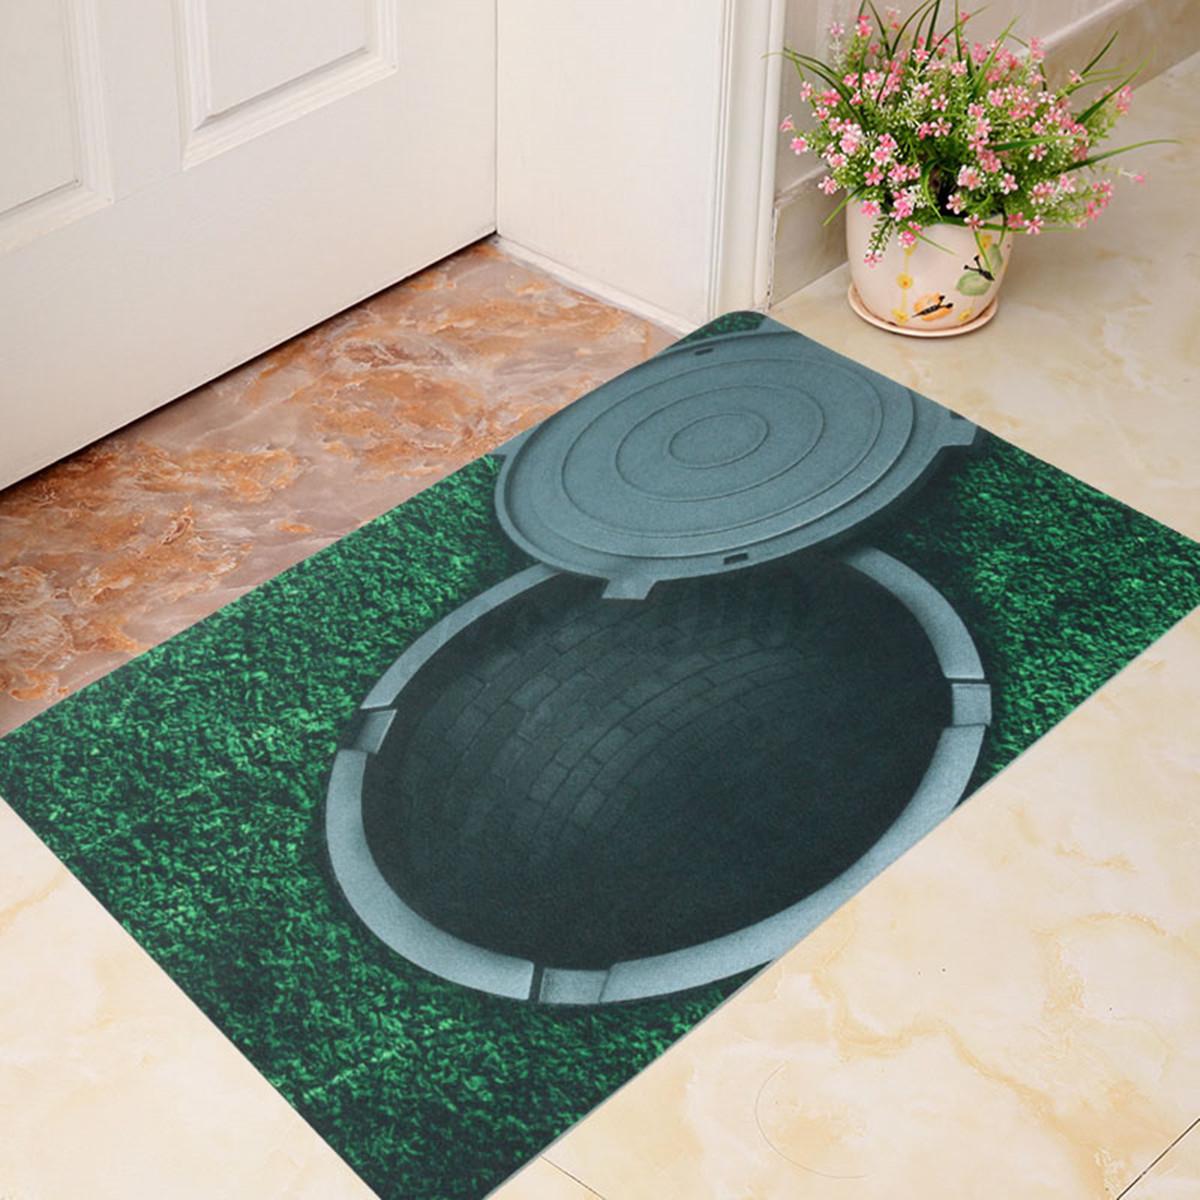 Nuovo 3d animal antiscivolo zerbino pavimento tappeto - Tappeto ingresso ...